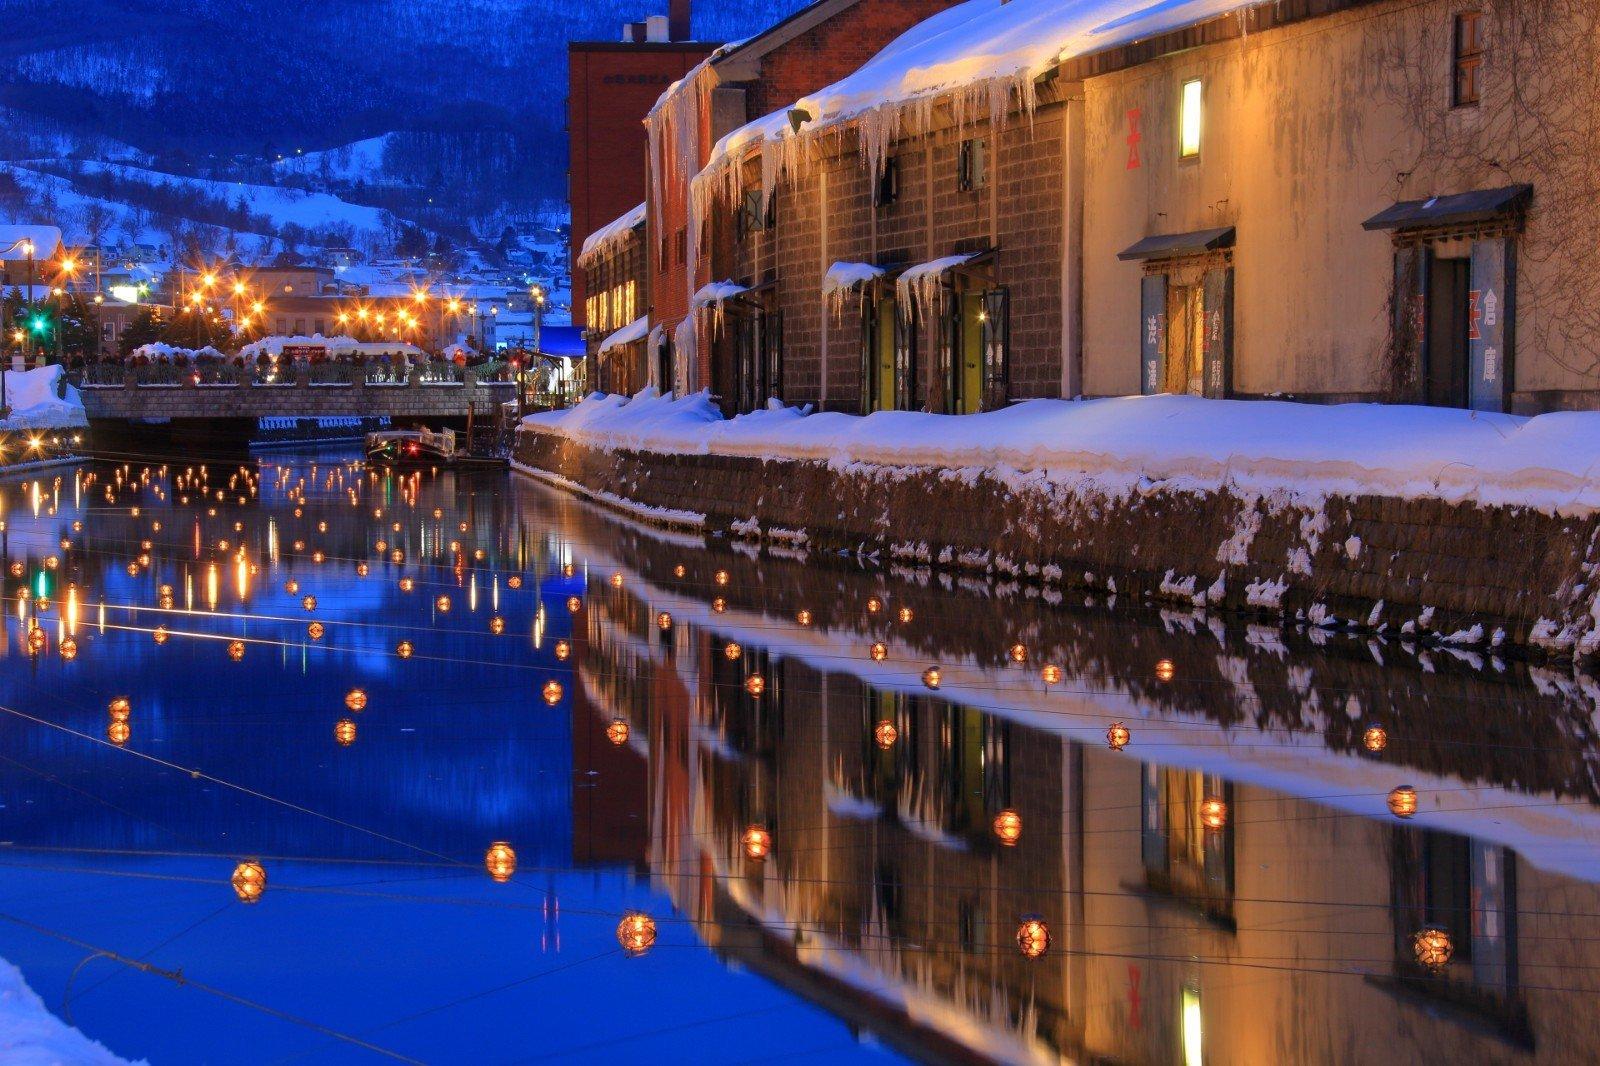 otaru lantern winter festival